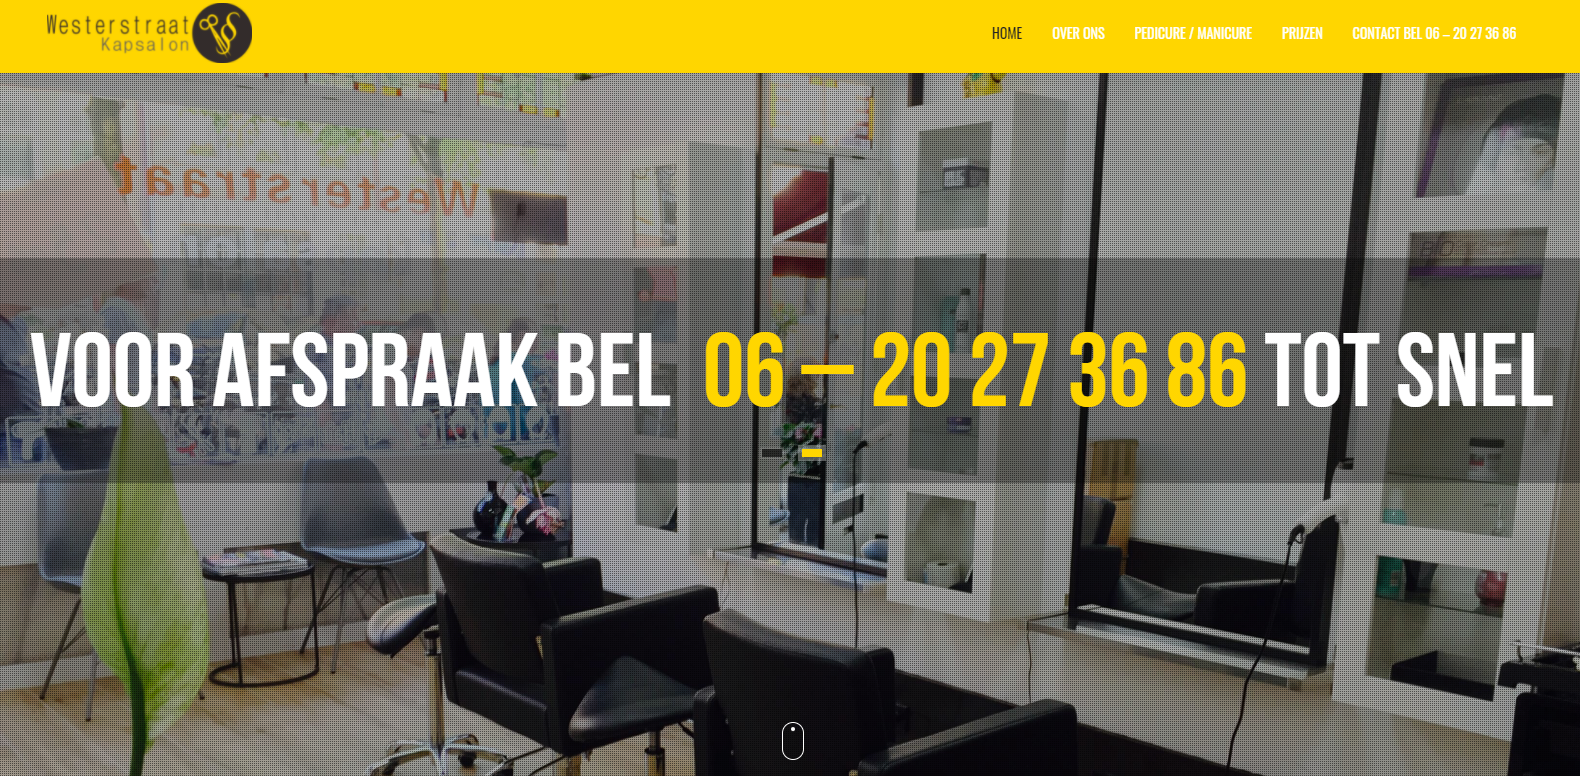 Westerstraatkapsalon webdesign